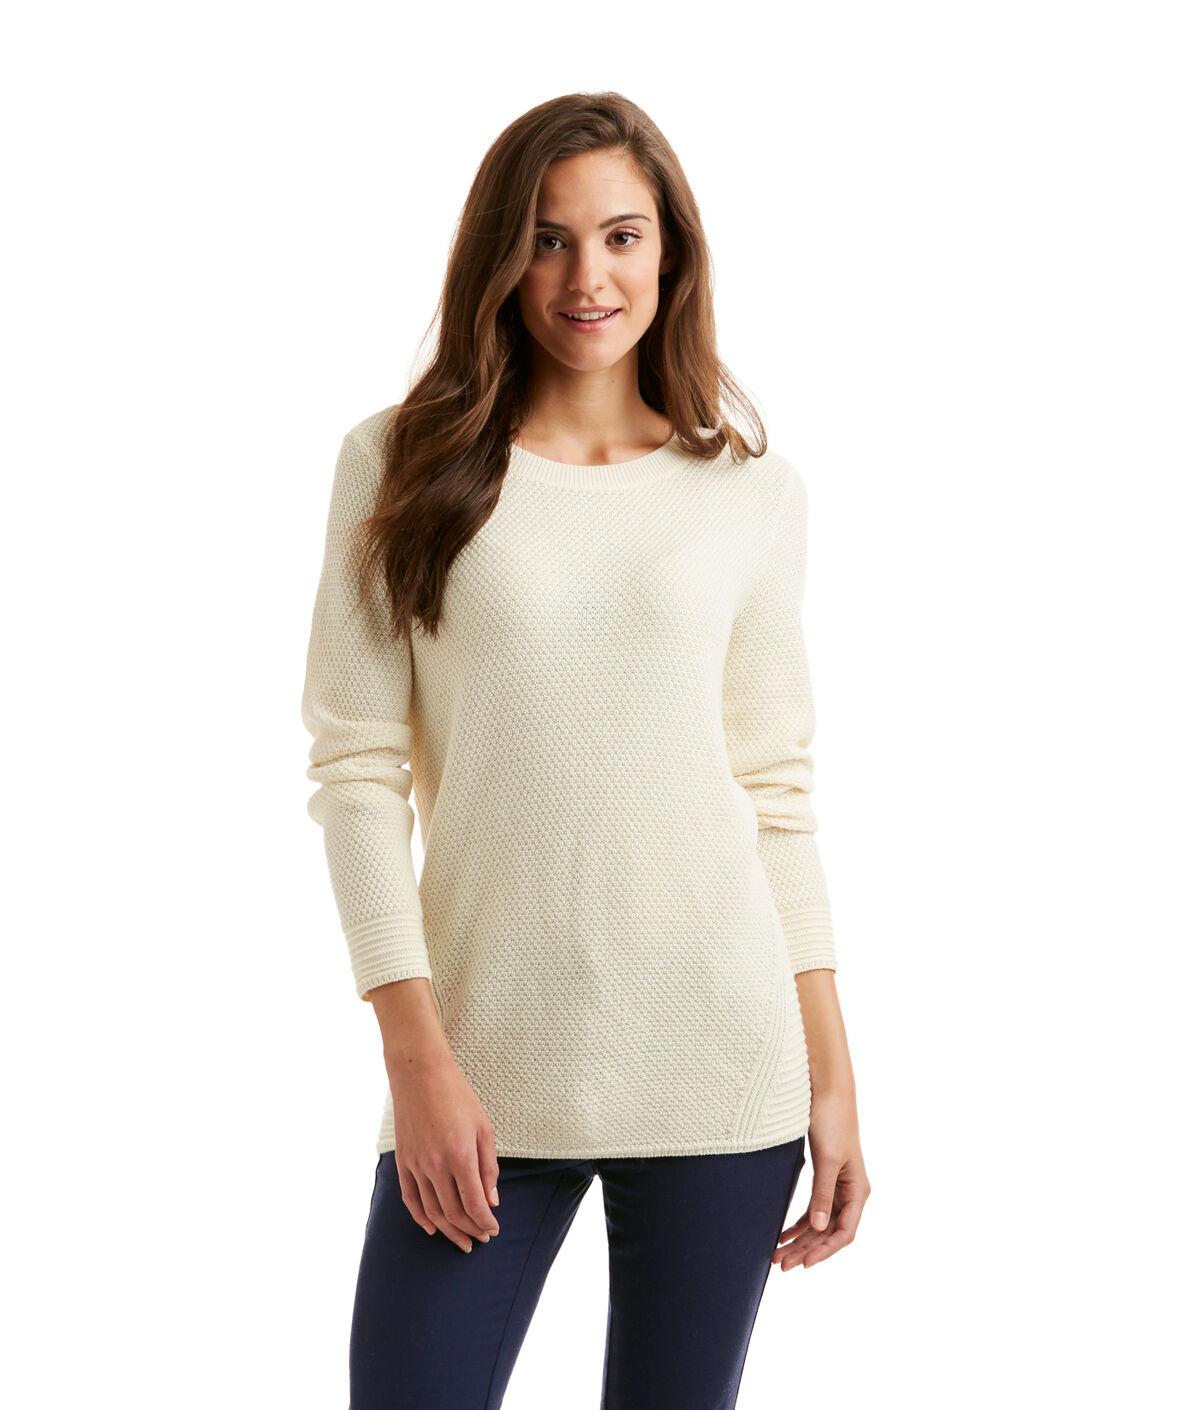 Shop Textured Crewneck Sweater at vineyard vines